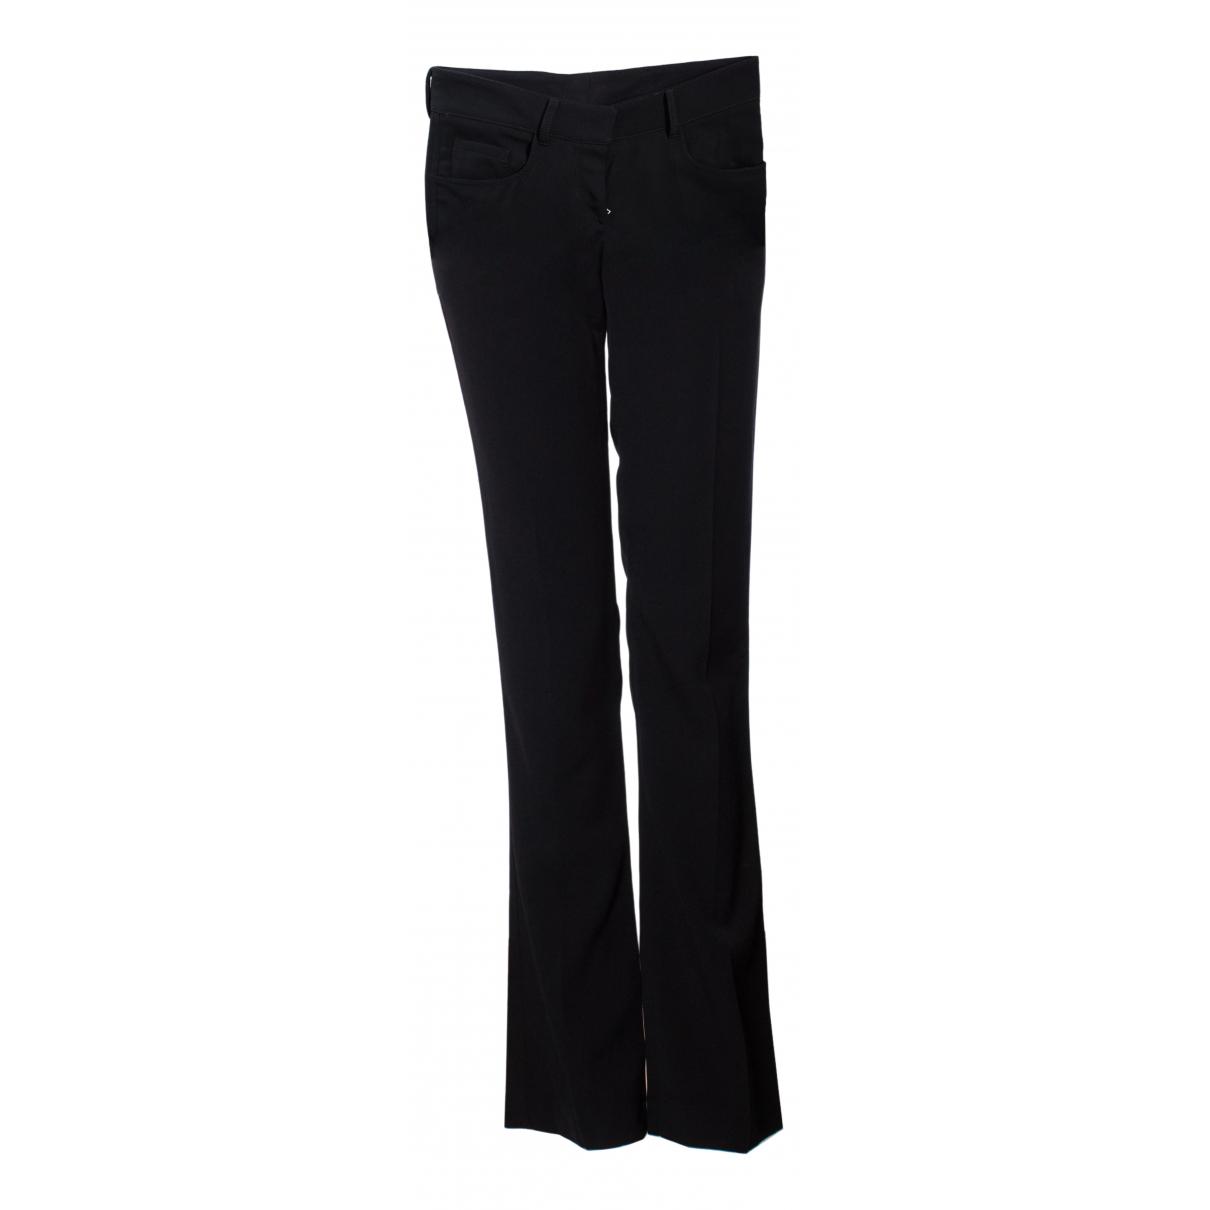 Prada - Pantalon   pour femme en coton - noir